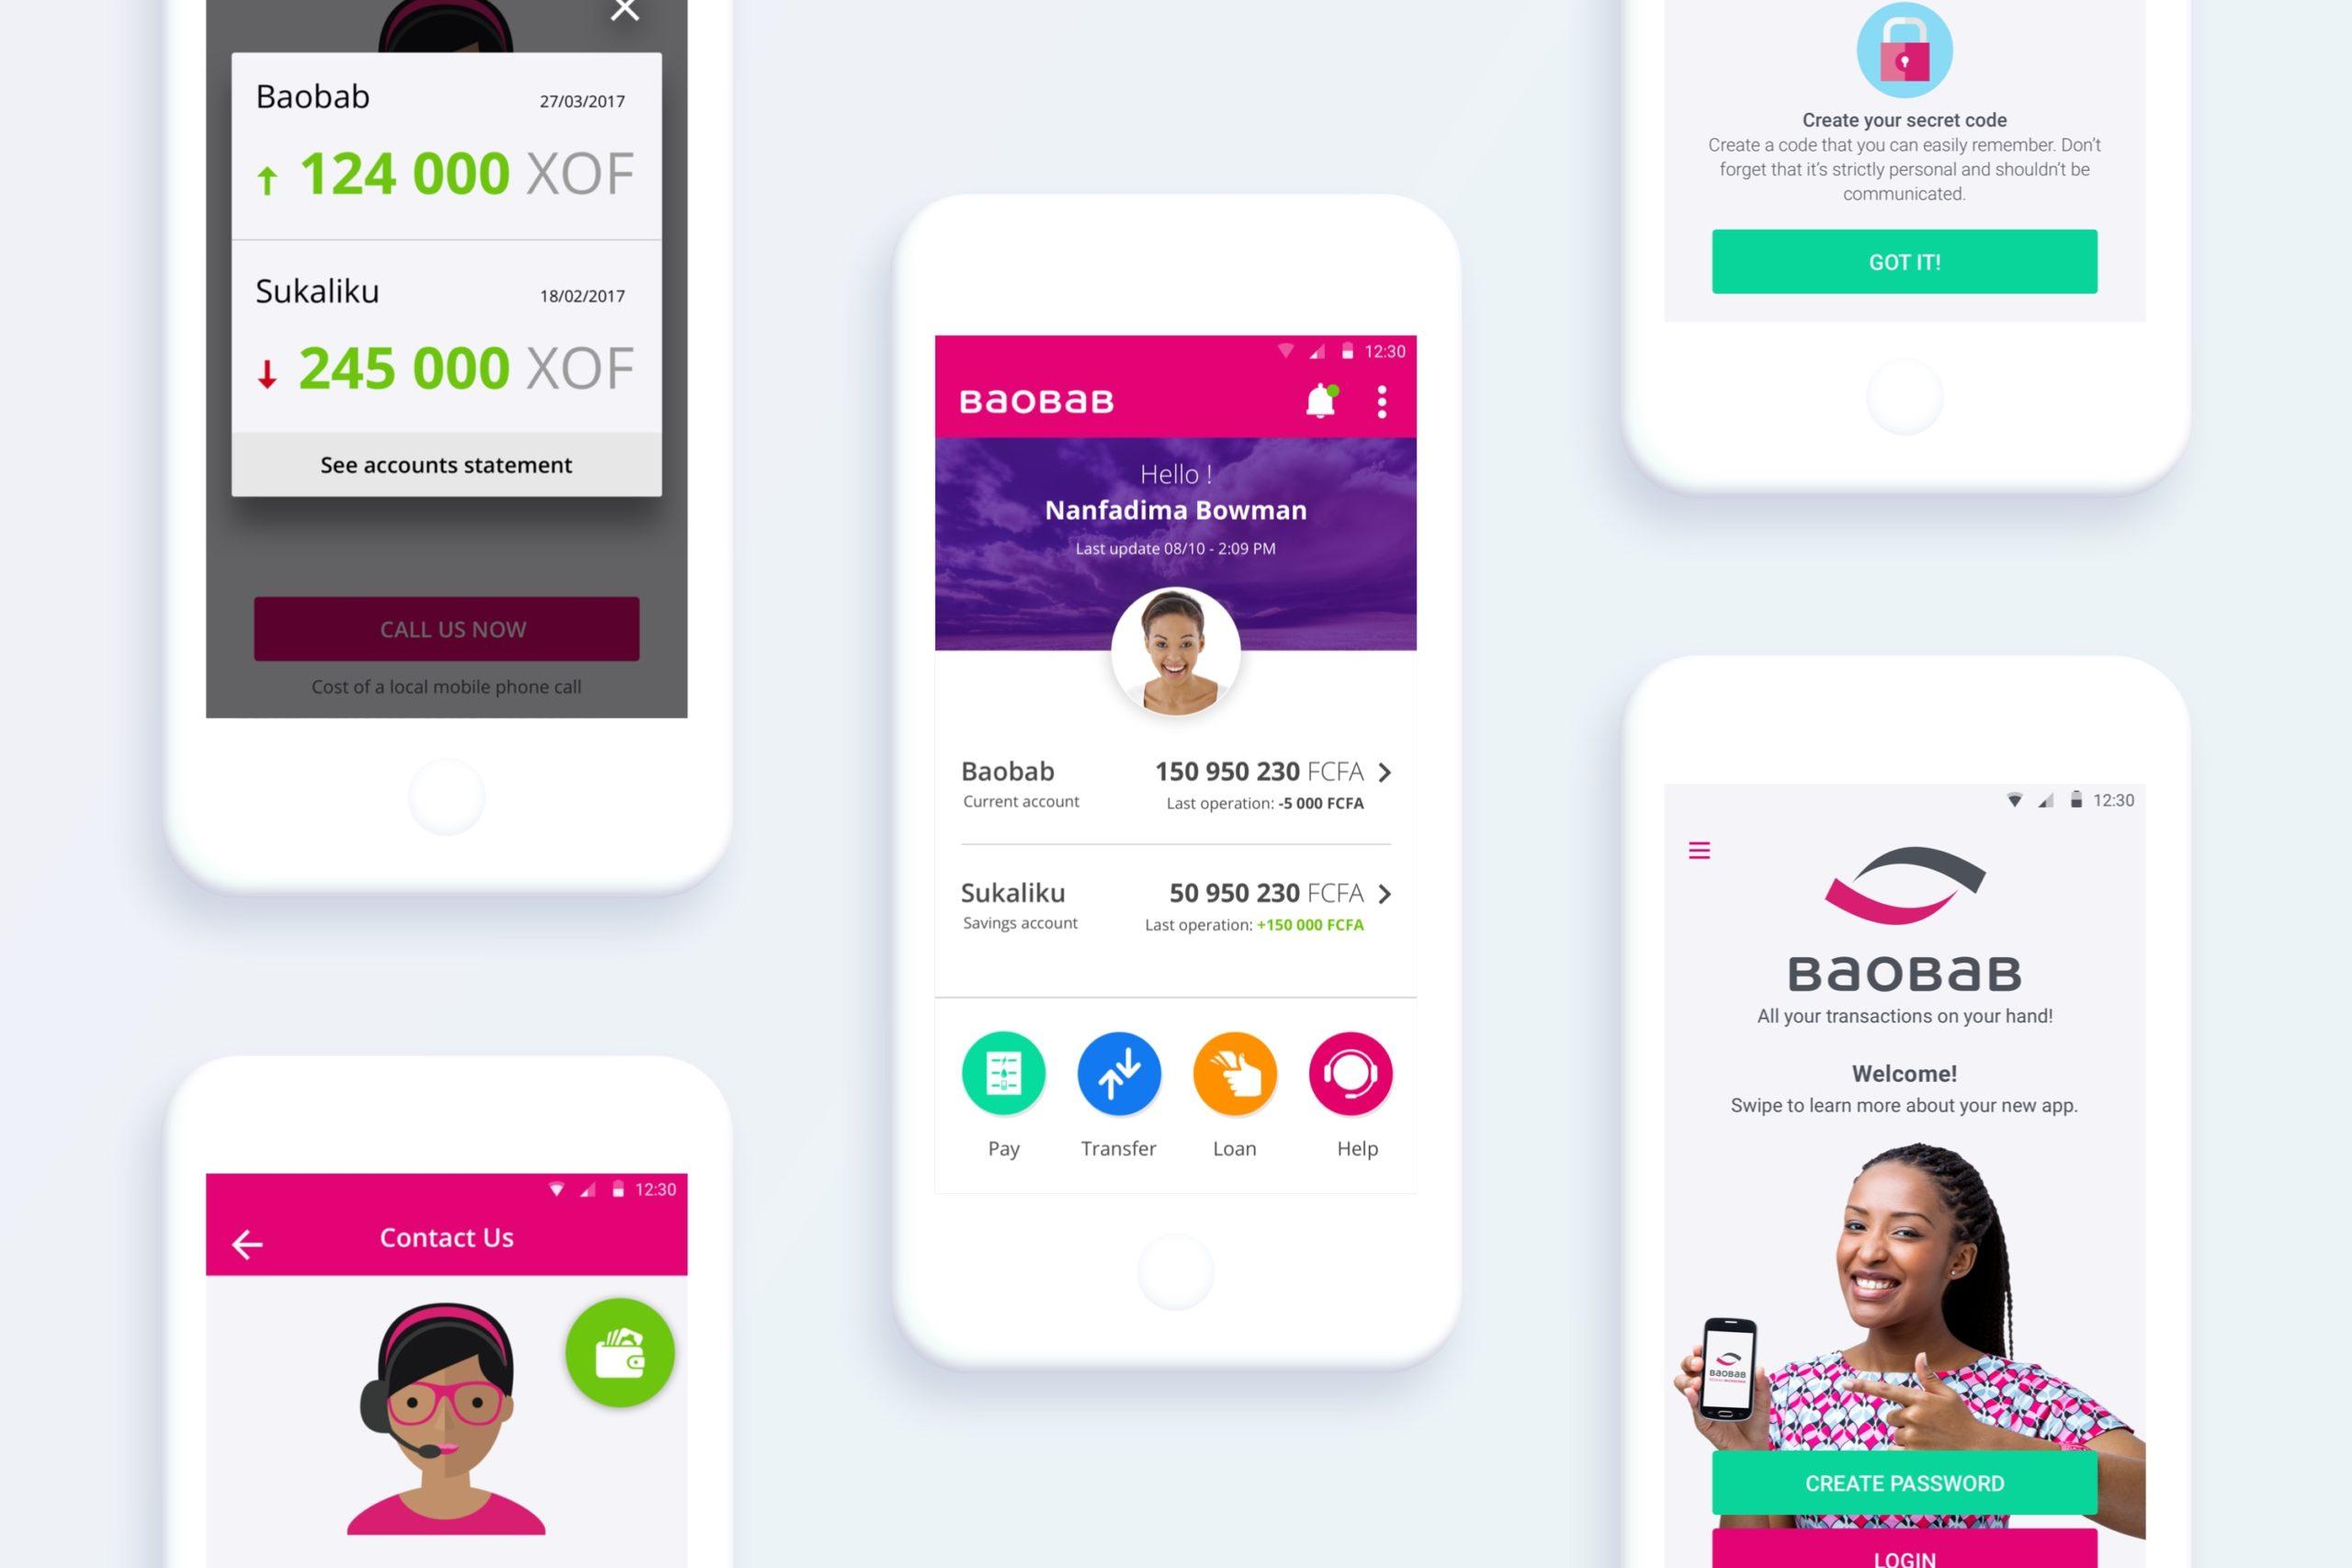 baobab app screens